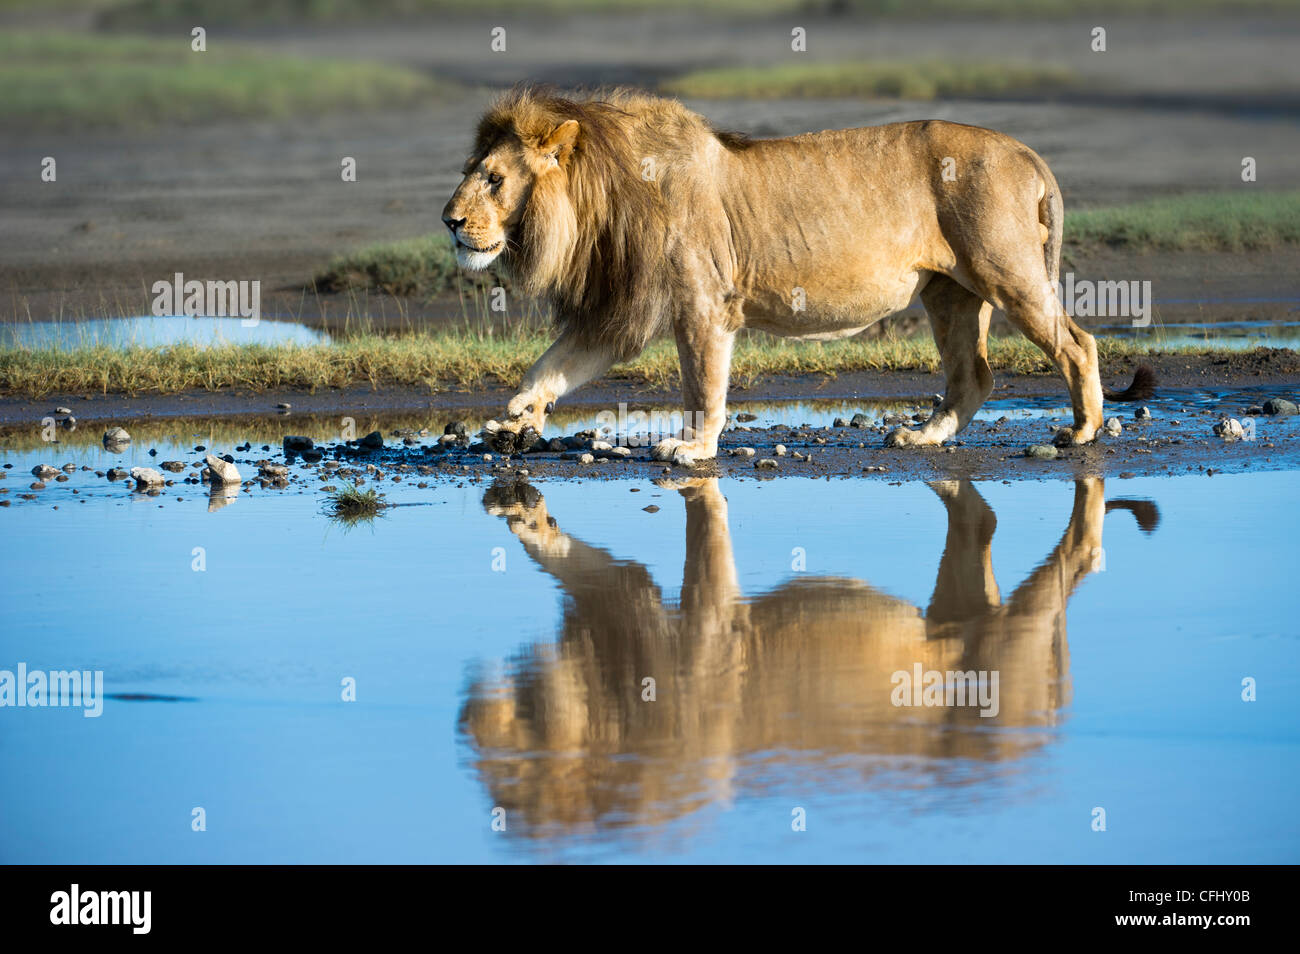 Male African Lion showing reflection at Big Marsh, Ngorongoro, Serengeti, Tanzania - Stock Image